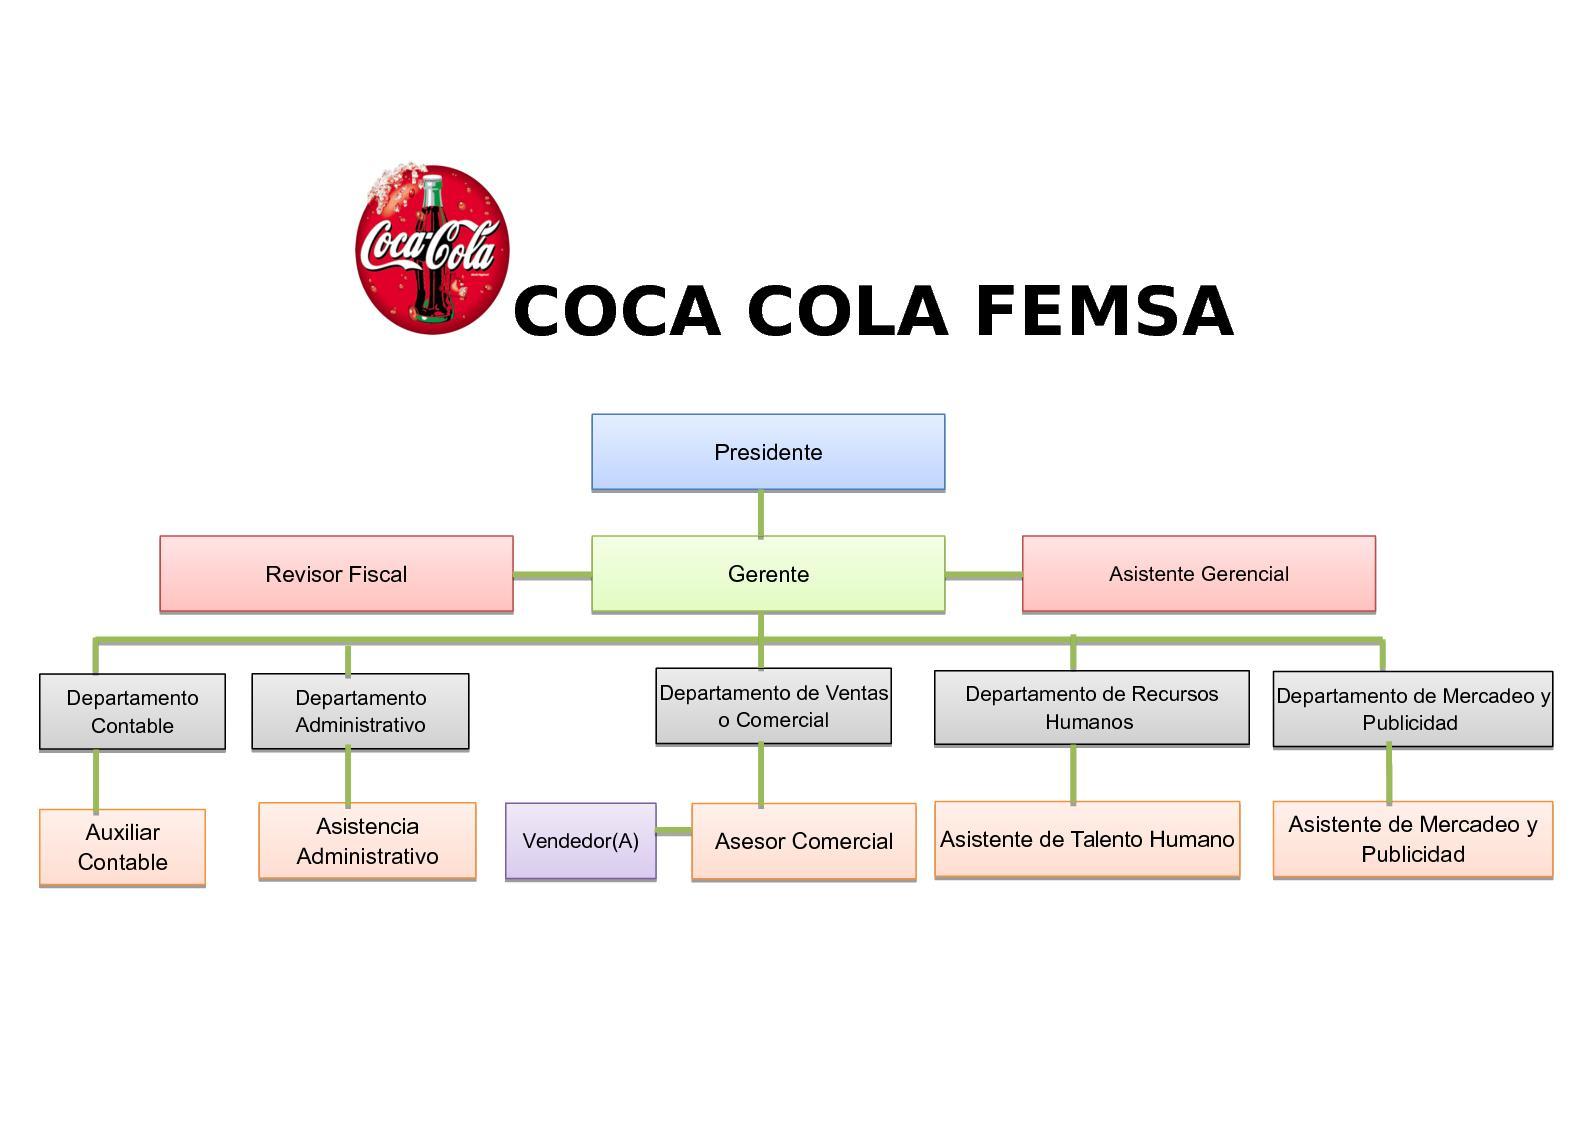 Organigrama Coca Cola Femsa Calameo Downloader